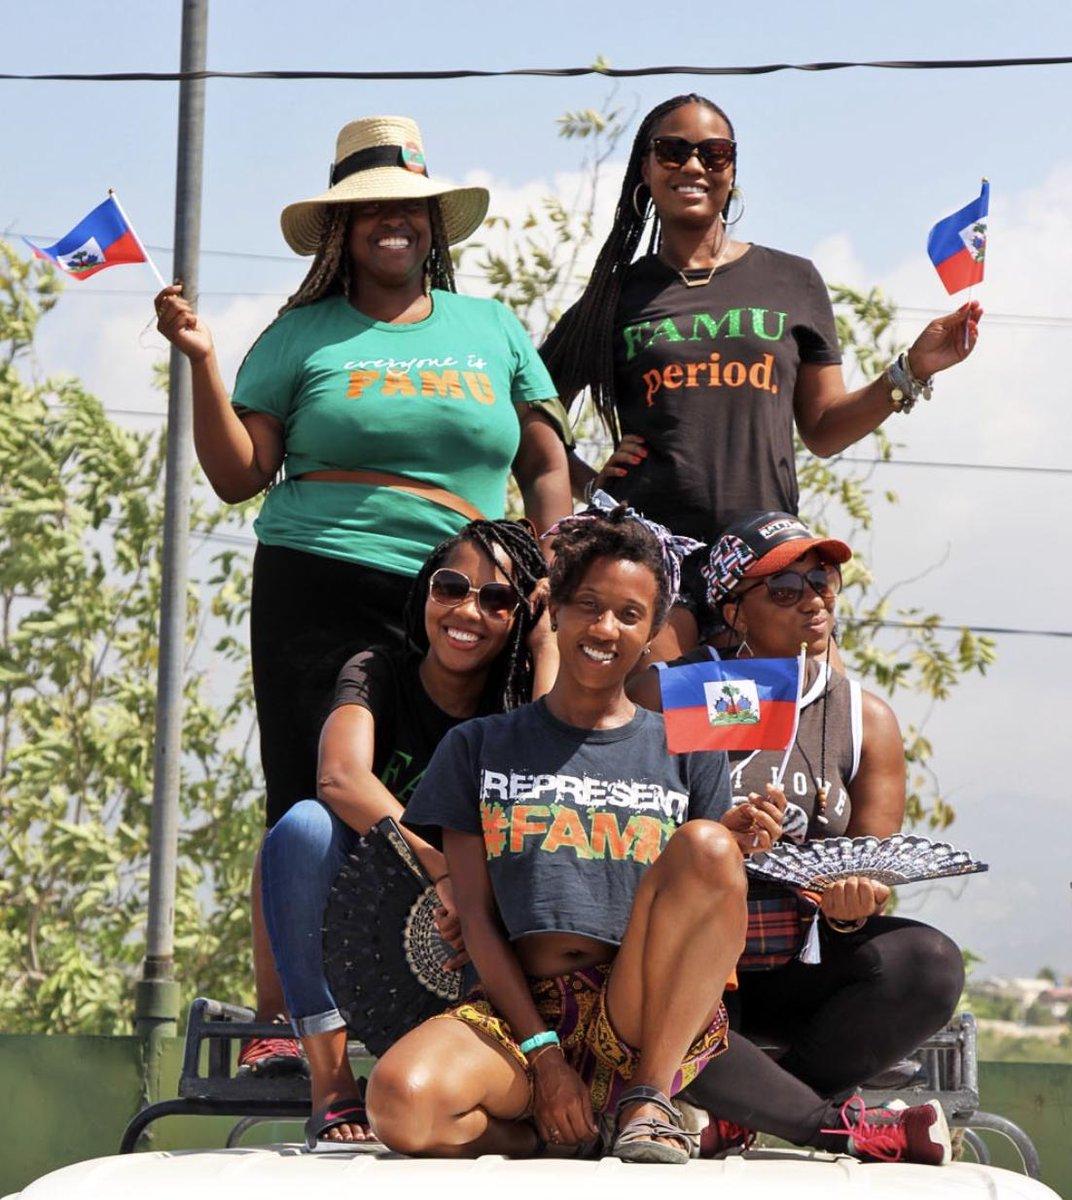 Black #Cosmopolitan FAMU Delta Sigma Theta Sorority Sisters Celebrate Anniversary By Giving Back in ... - http://blkcosmo.com/famu-delta-sigma-theta-sorority-sisters-celebrate-anniversary-by-giving-back-in-haiti/… #Countries #DeltaSigmaTheta #FraternitiesAndSororitiesInTheUnitedStates #NationalPanHellenicCouncil #Organizations #Sisterhood #StudentOrganizations